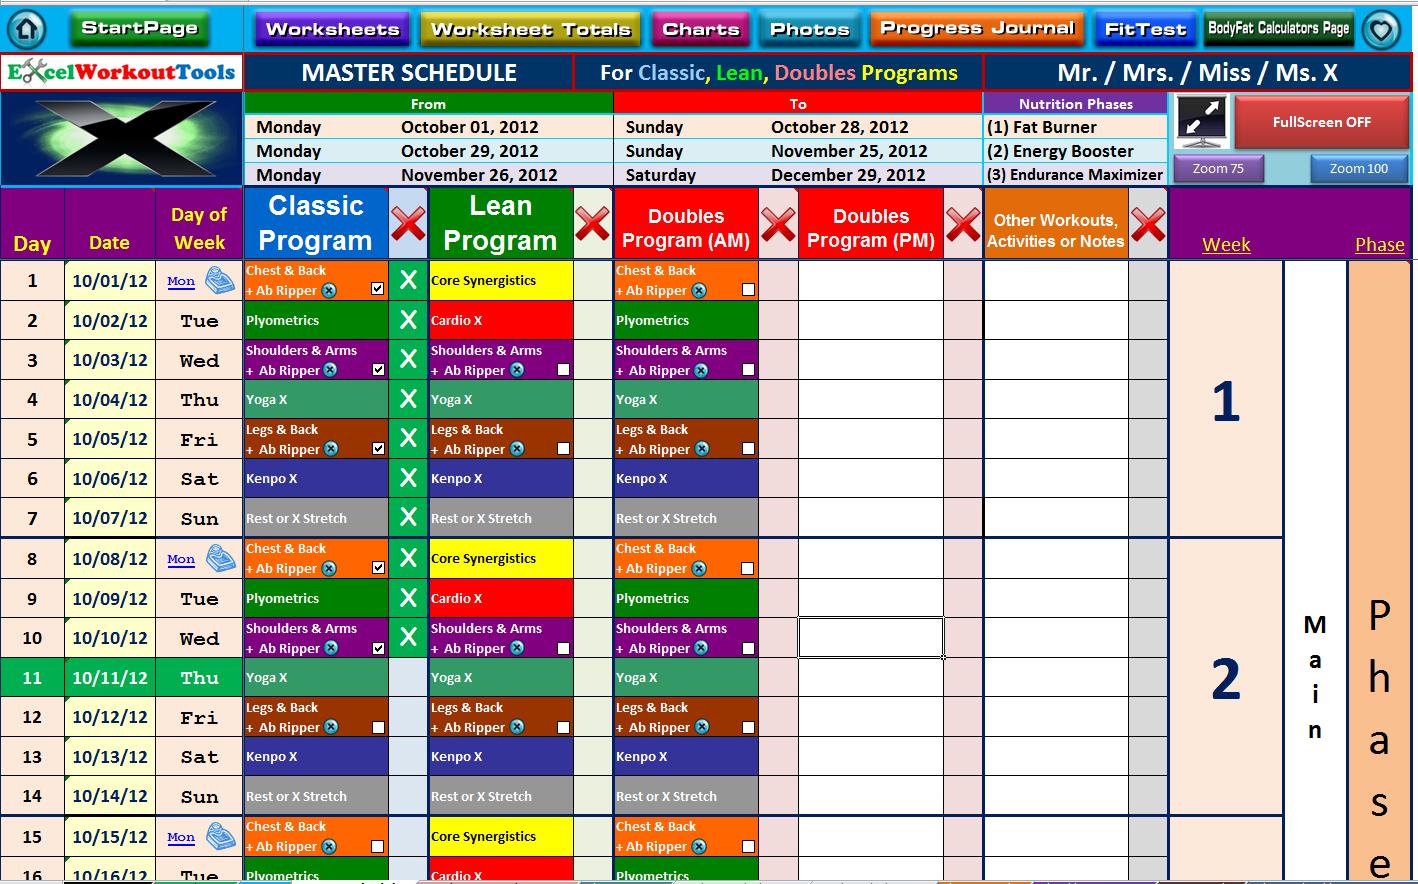 Weather Excel Spreadsheet Regarding P90X « Excel Workout Tools